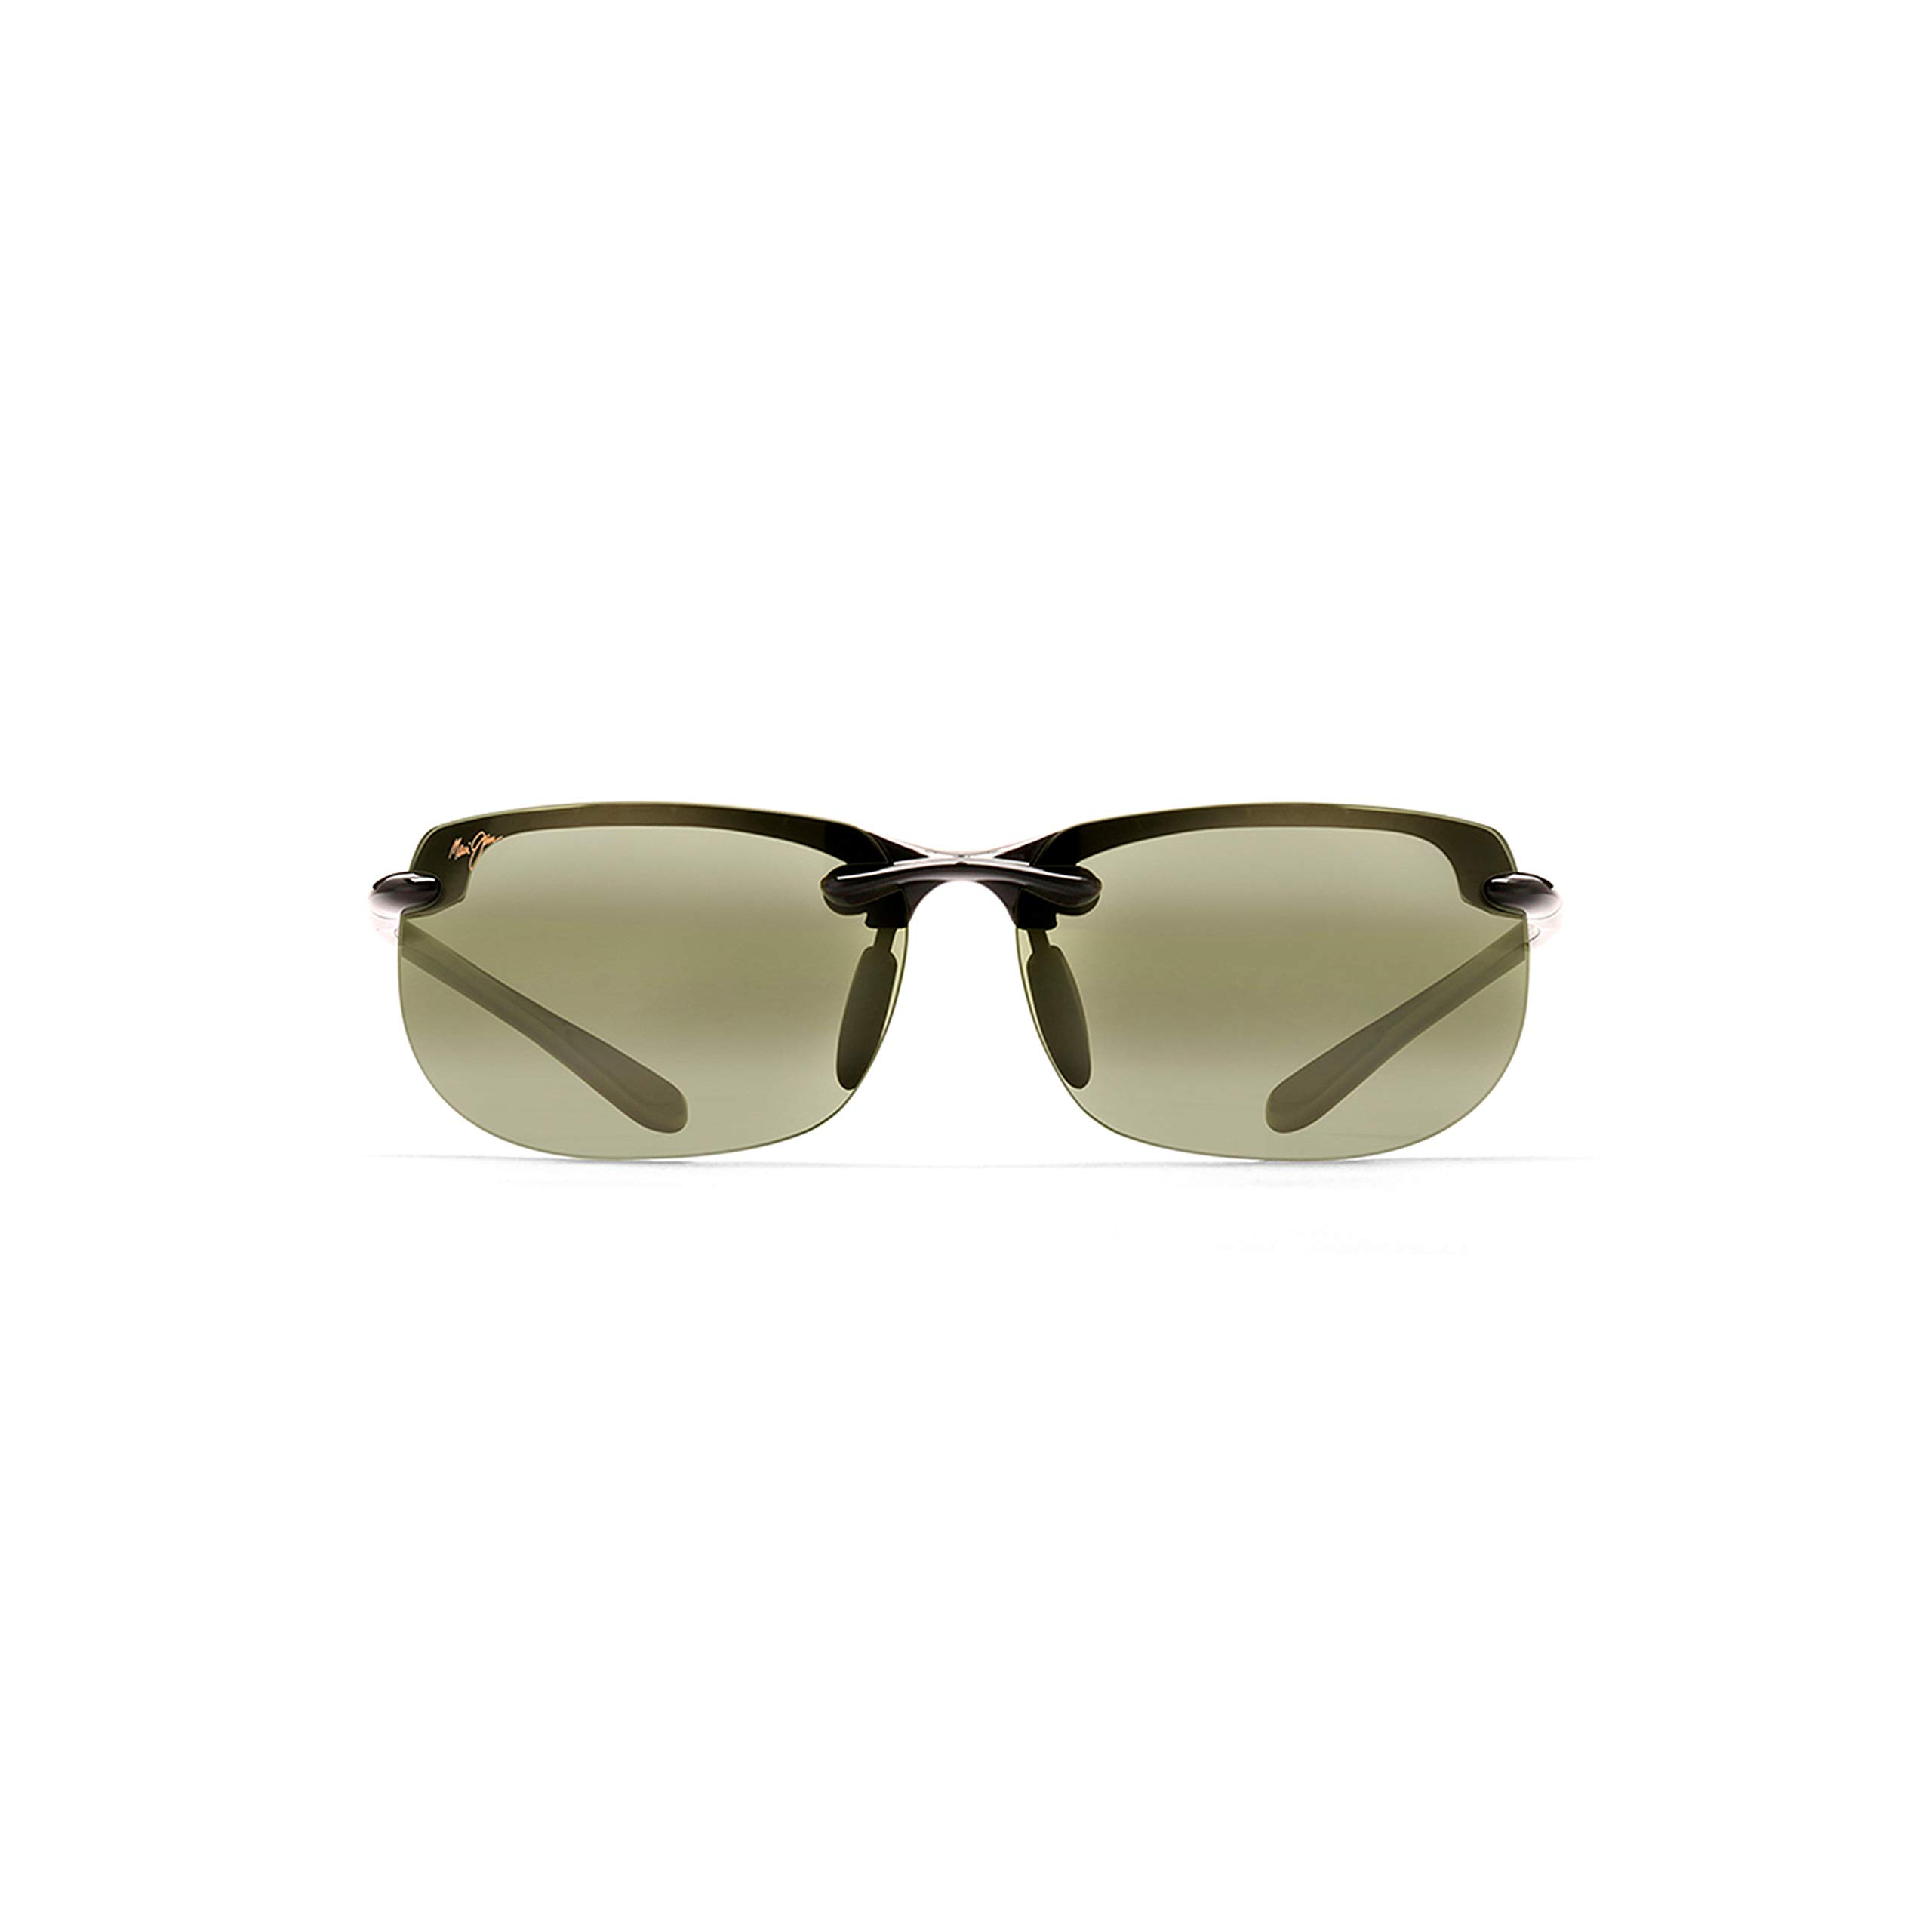 Maui Jim Banyans HT412-02   Polarized Rimless Sunglasses, Gloss Black with Maui HT, with with Patented PolarizedPlus2 Lens Technology